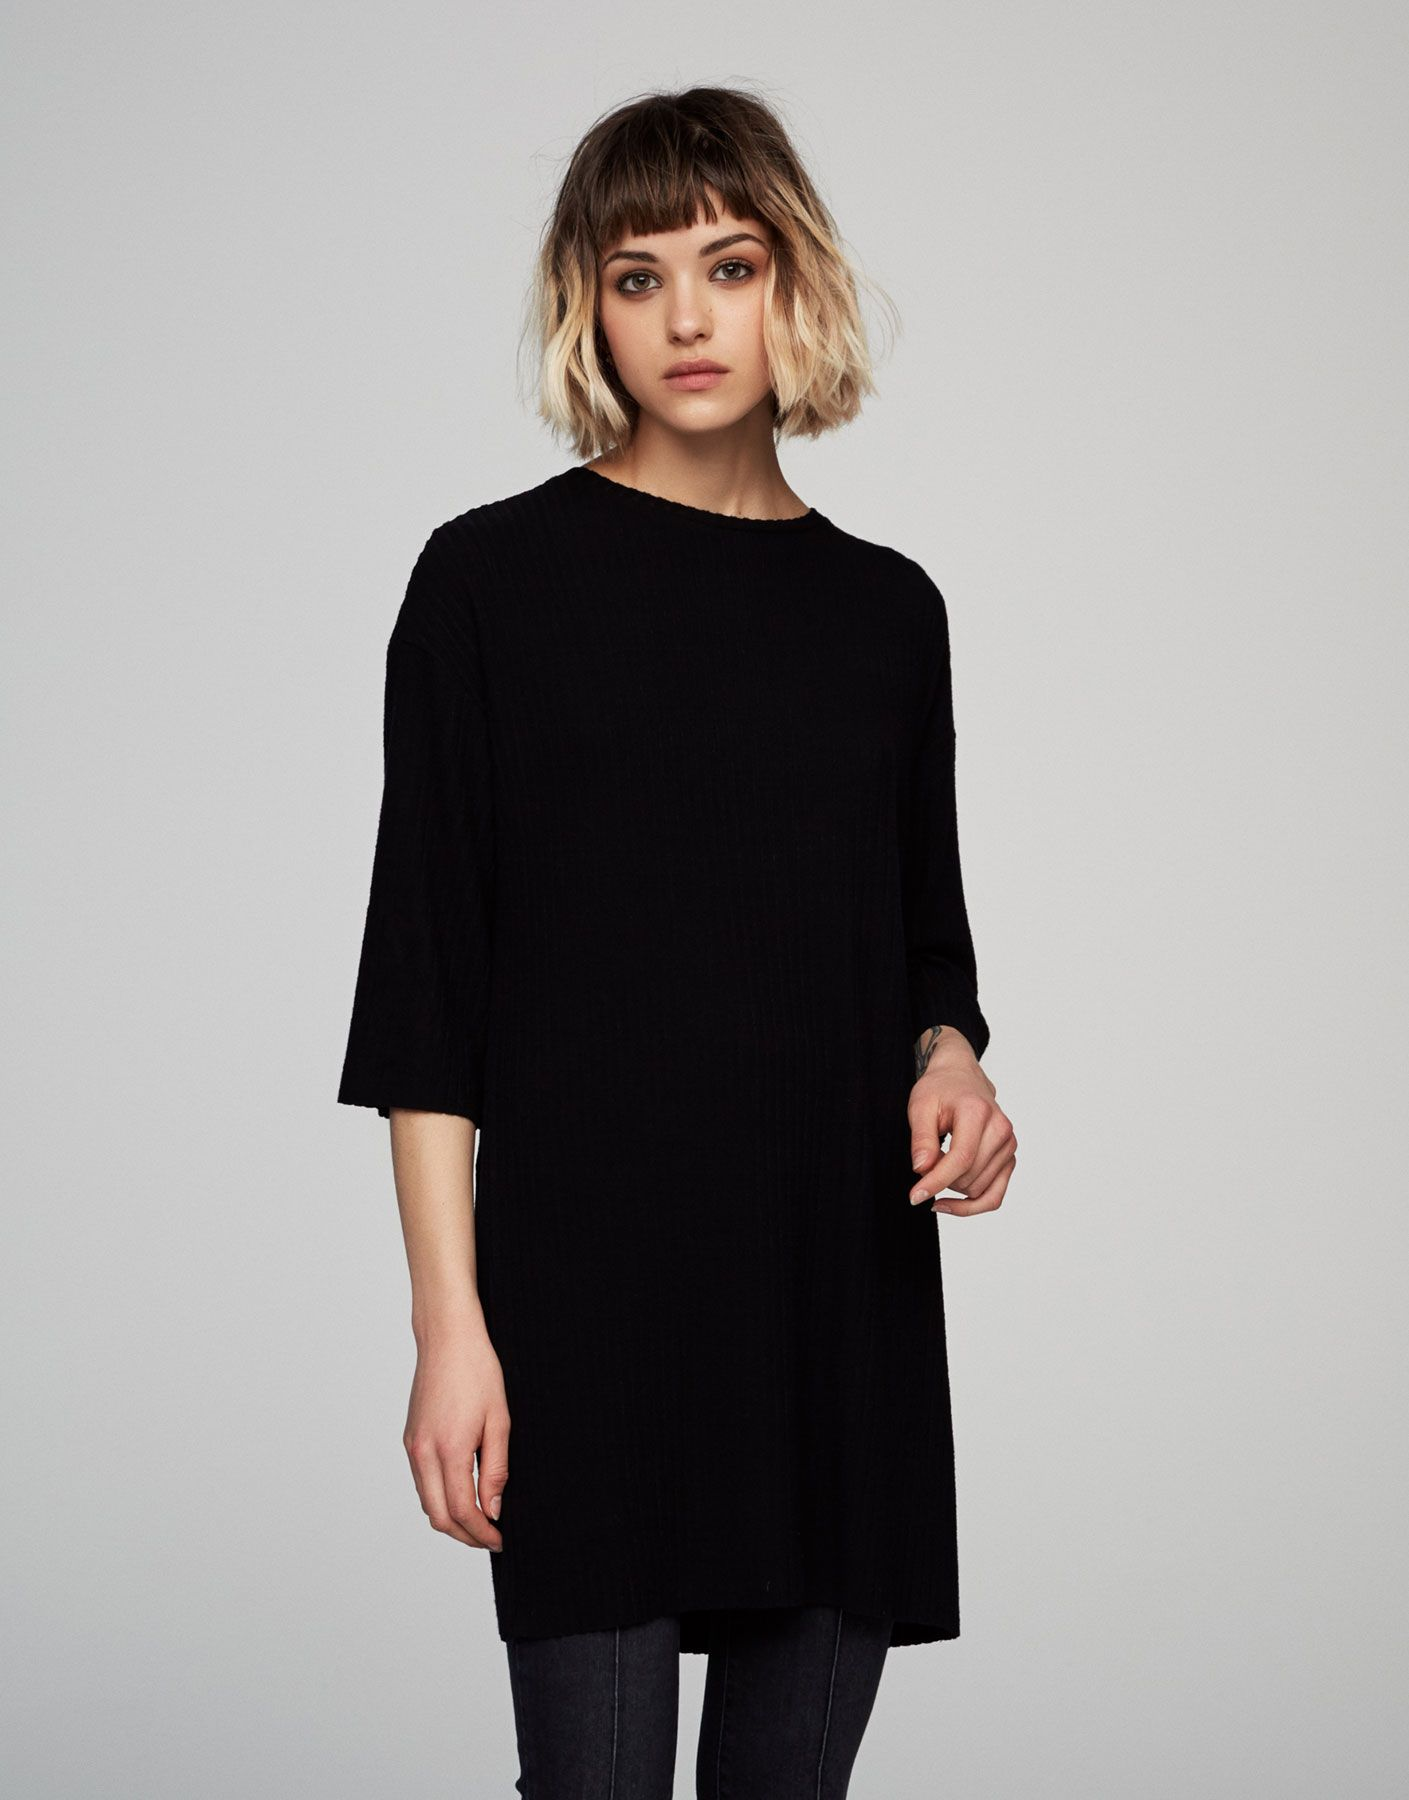 Short sleeved ribbed dress dresses clothing woman pullubear